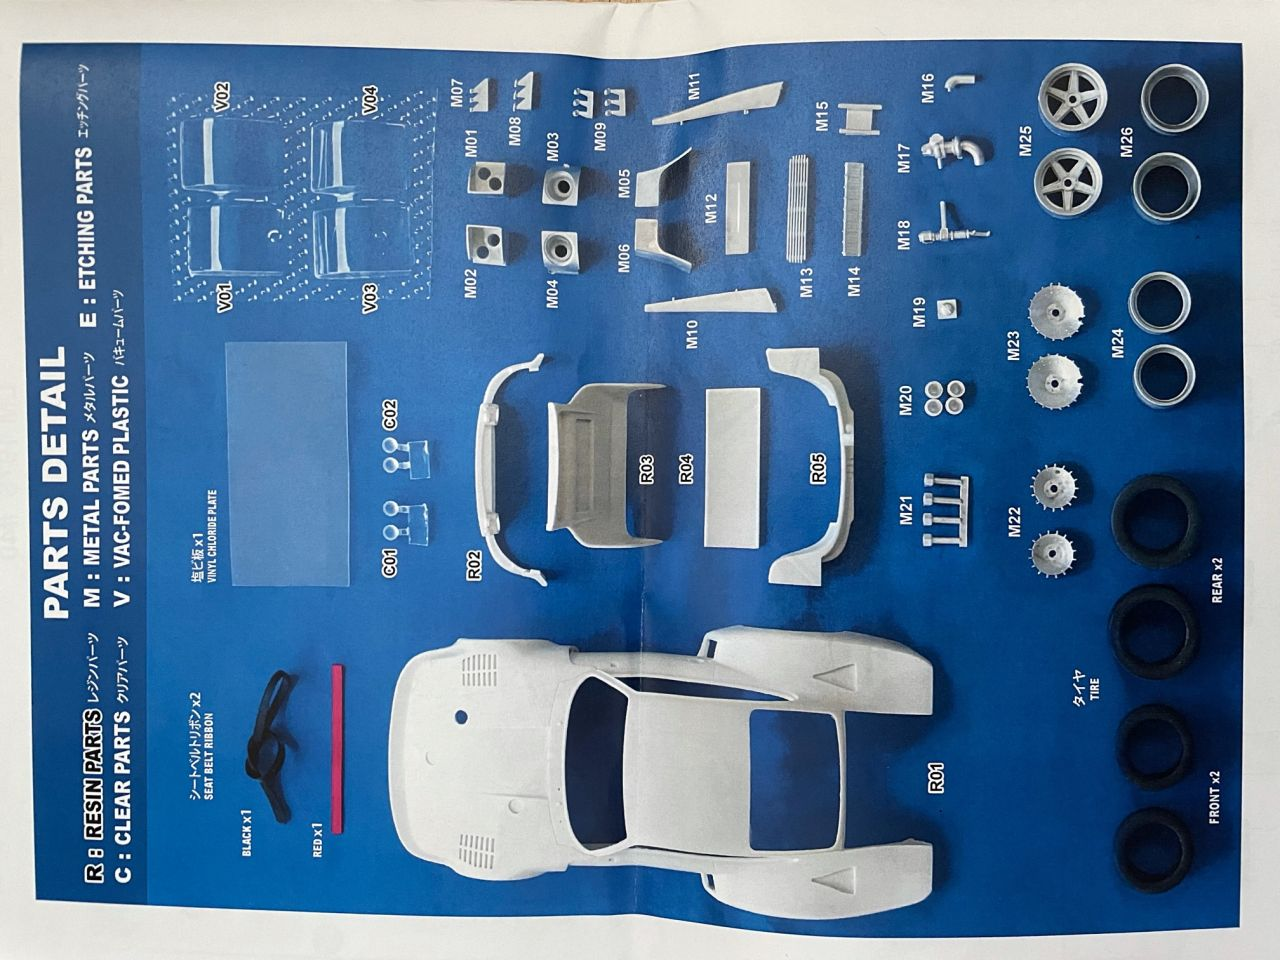 Studio27 TK2473 Porsche 935 #40 LM 1976 conversion kit